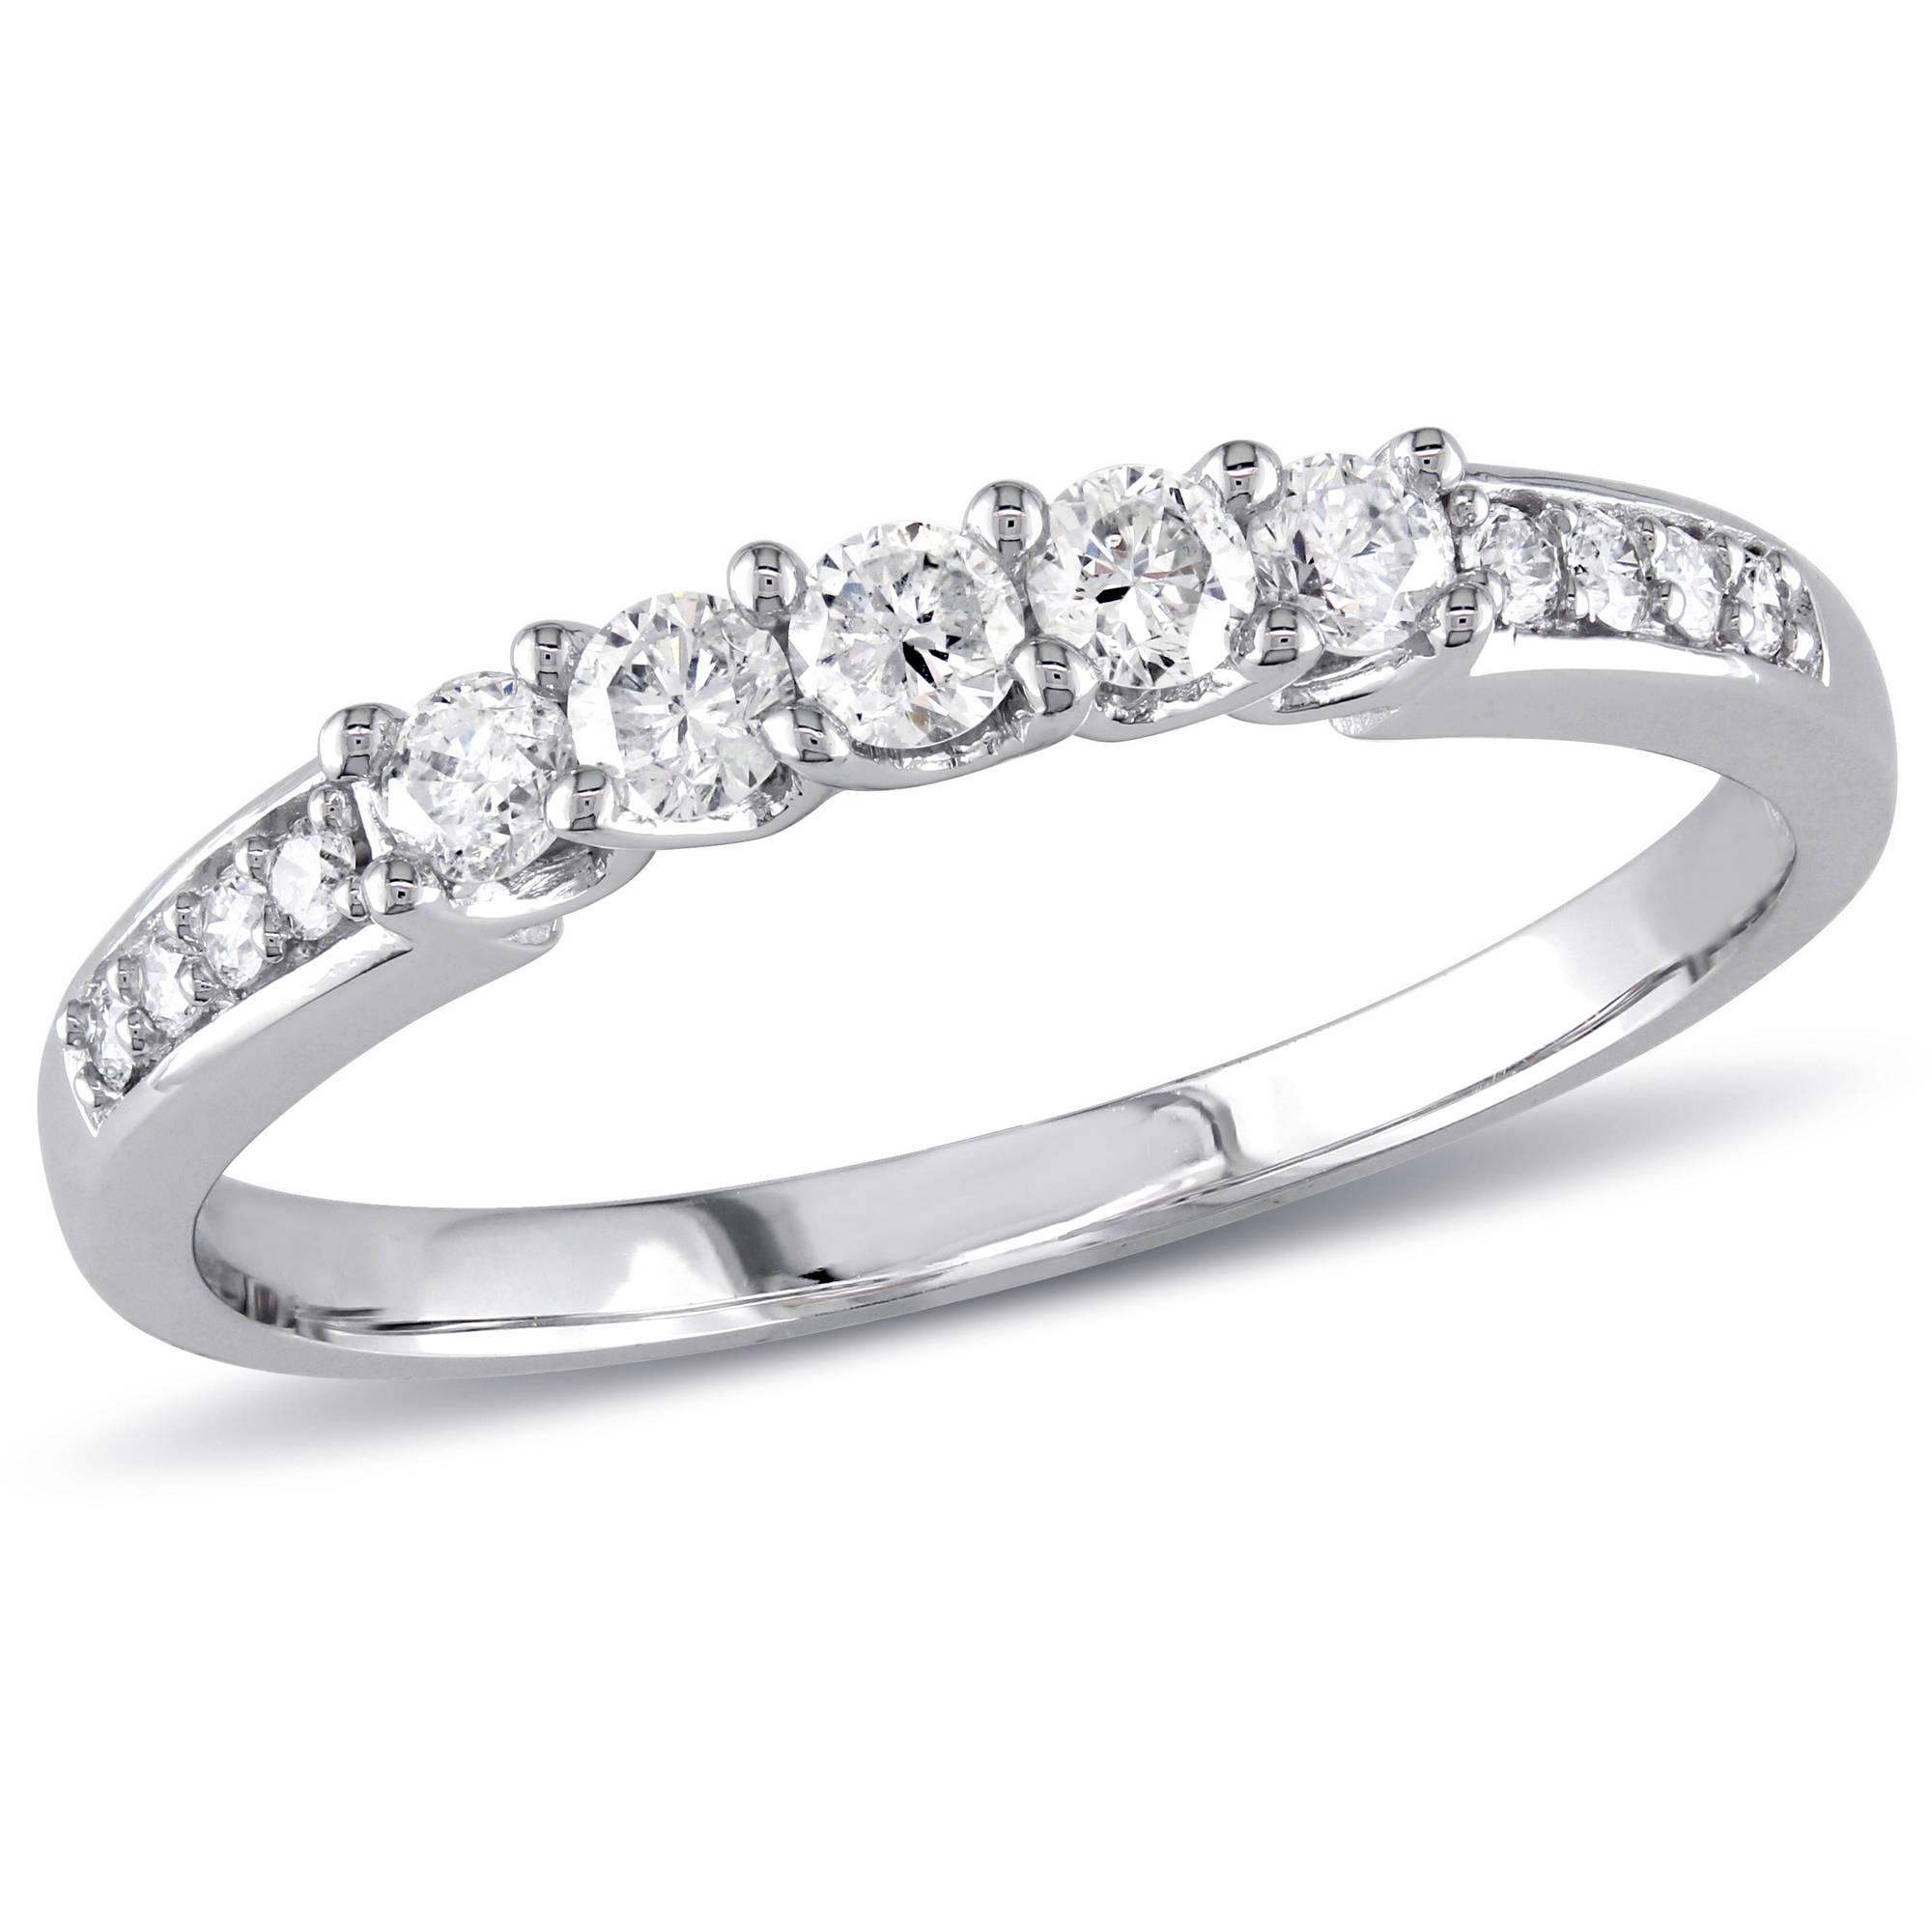 Miabella 1/3 Carat T.W. Diamond 14kt White Gold Wedding Band